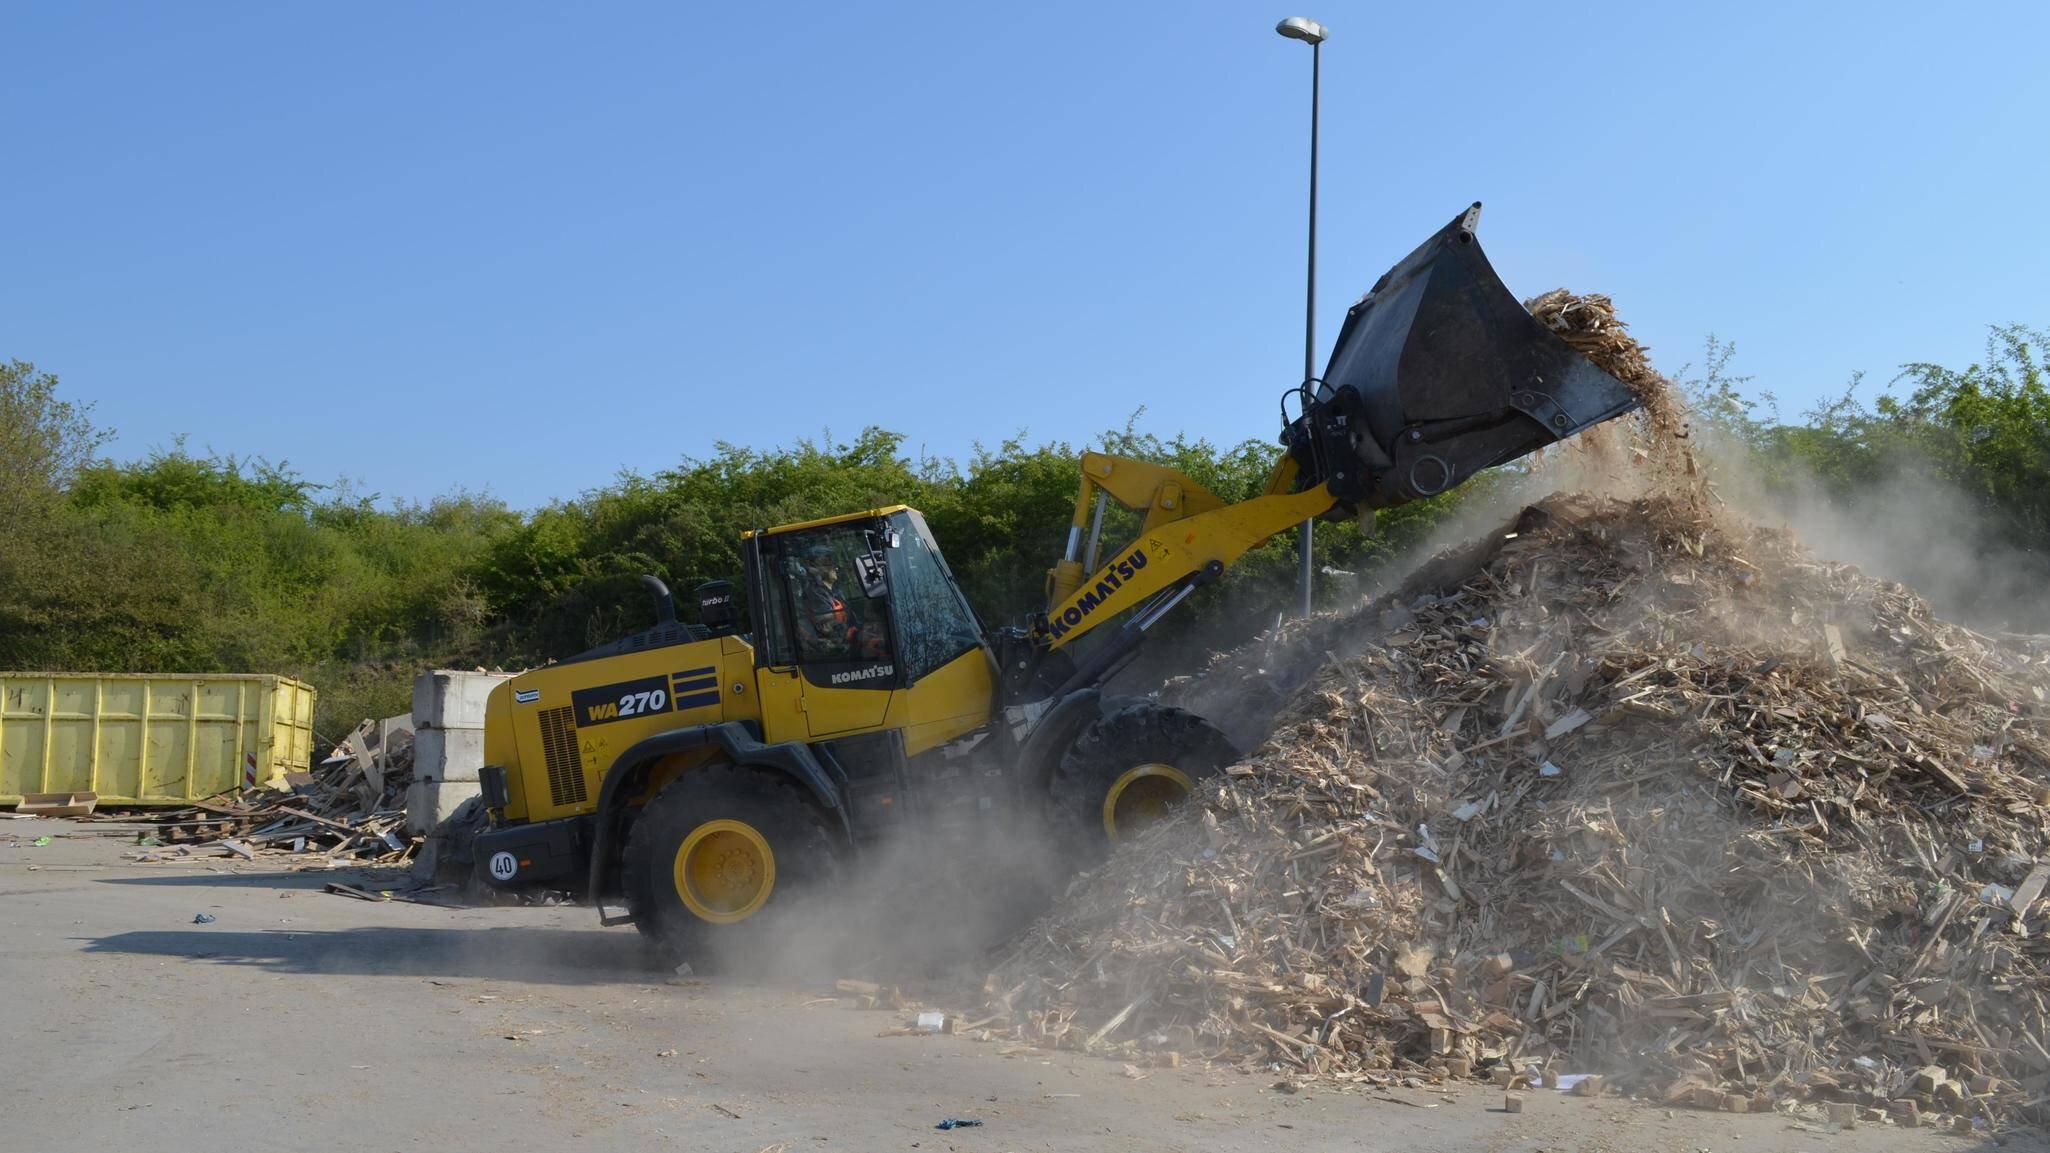 Gallery image 0 - Komatsu wheel loader WA270 in waste & recycling operation.